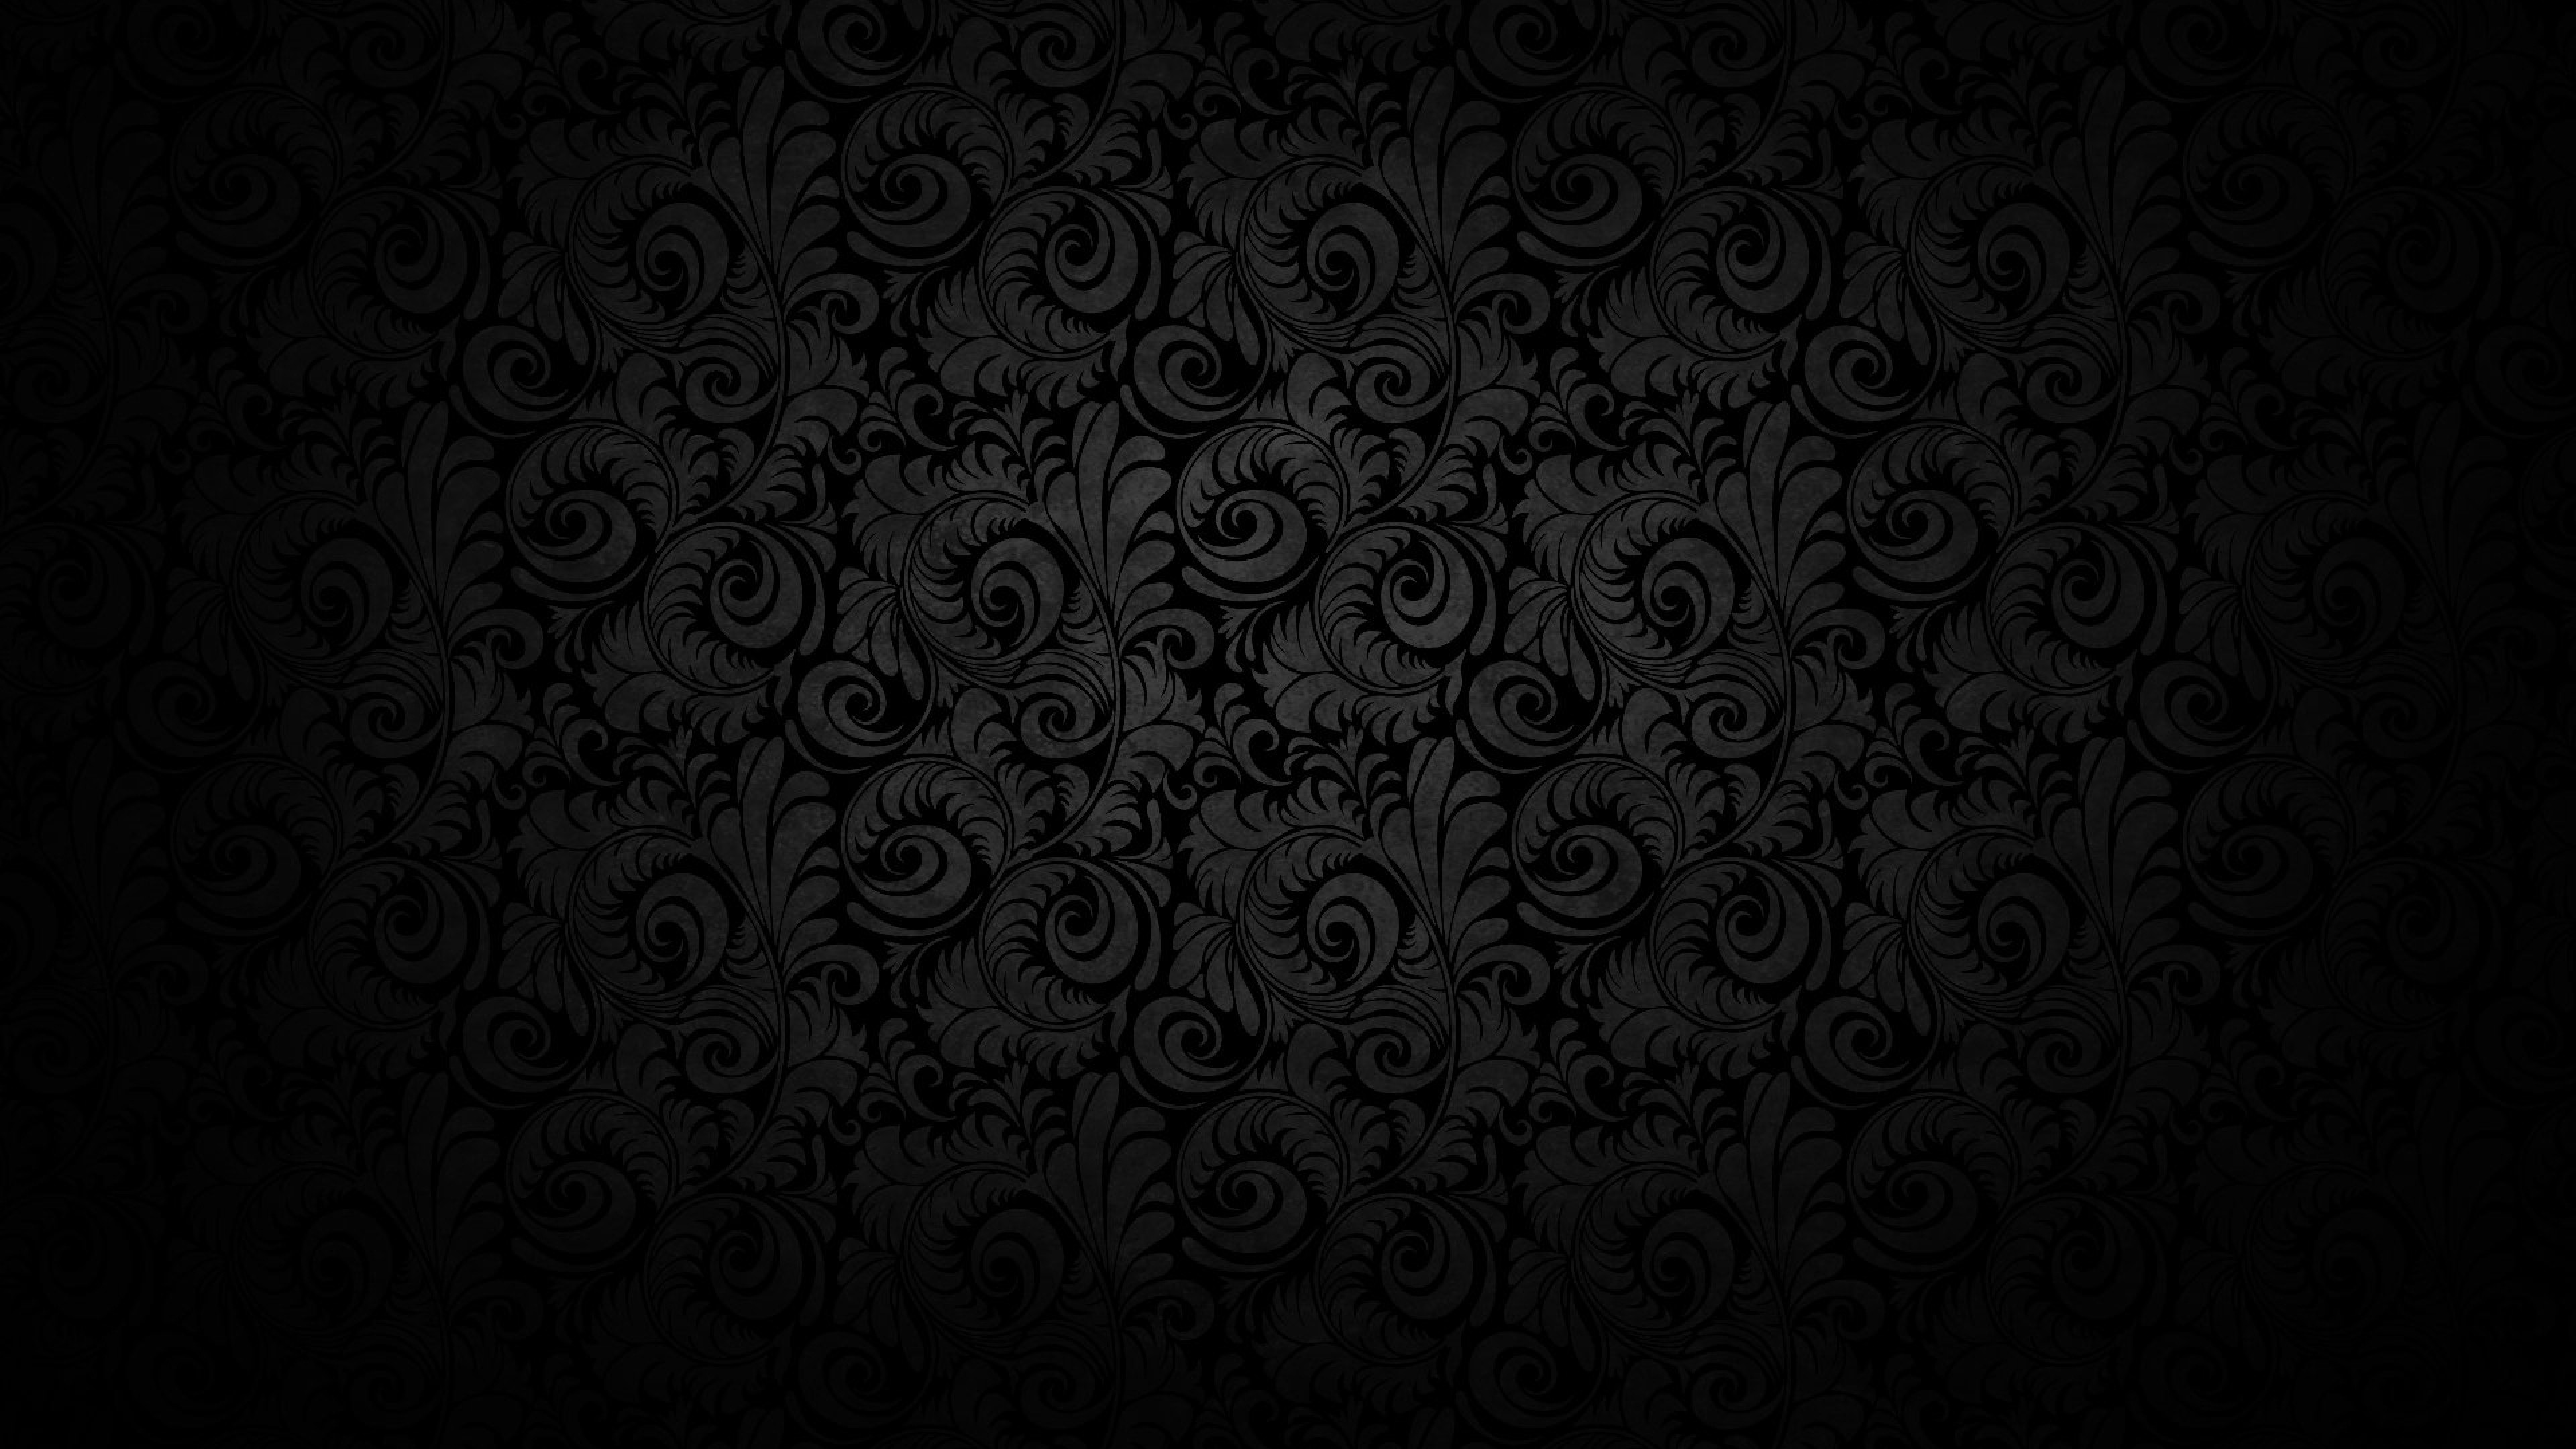 black hd wallpaper 4k